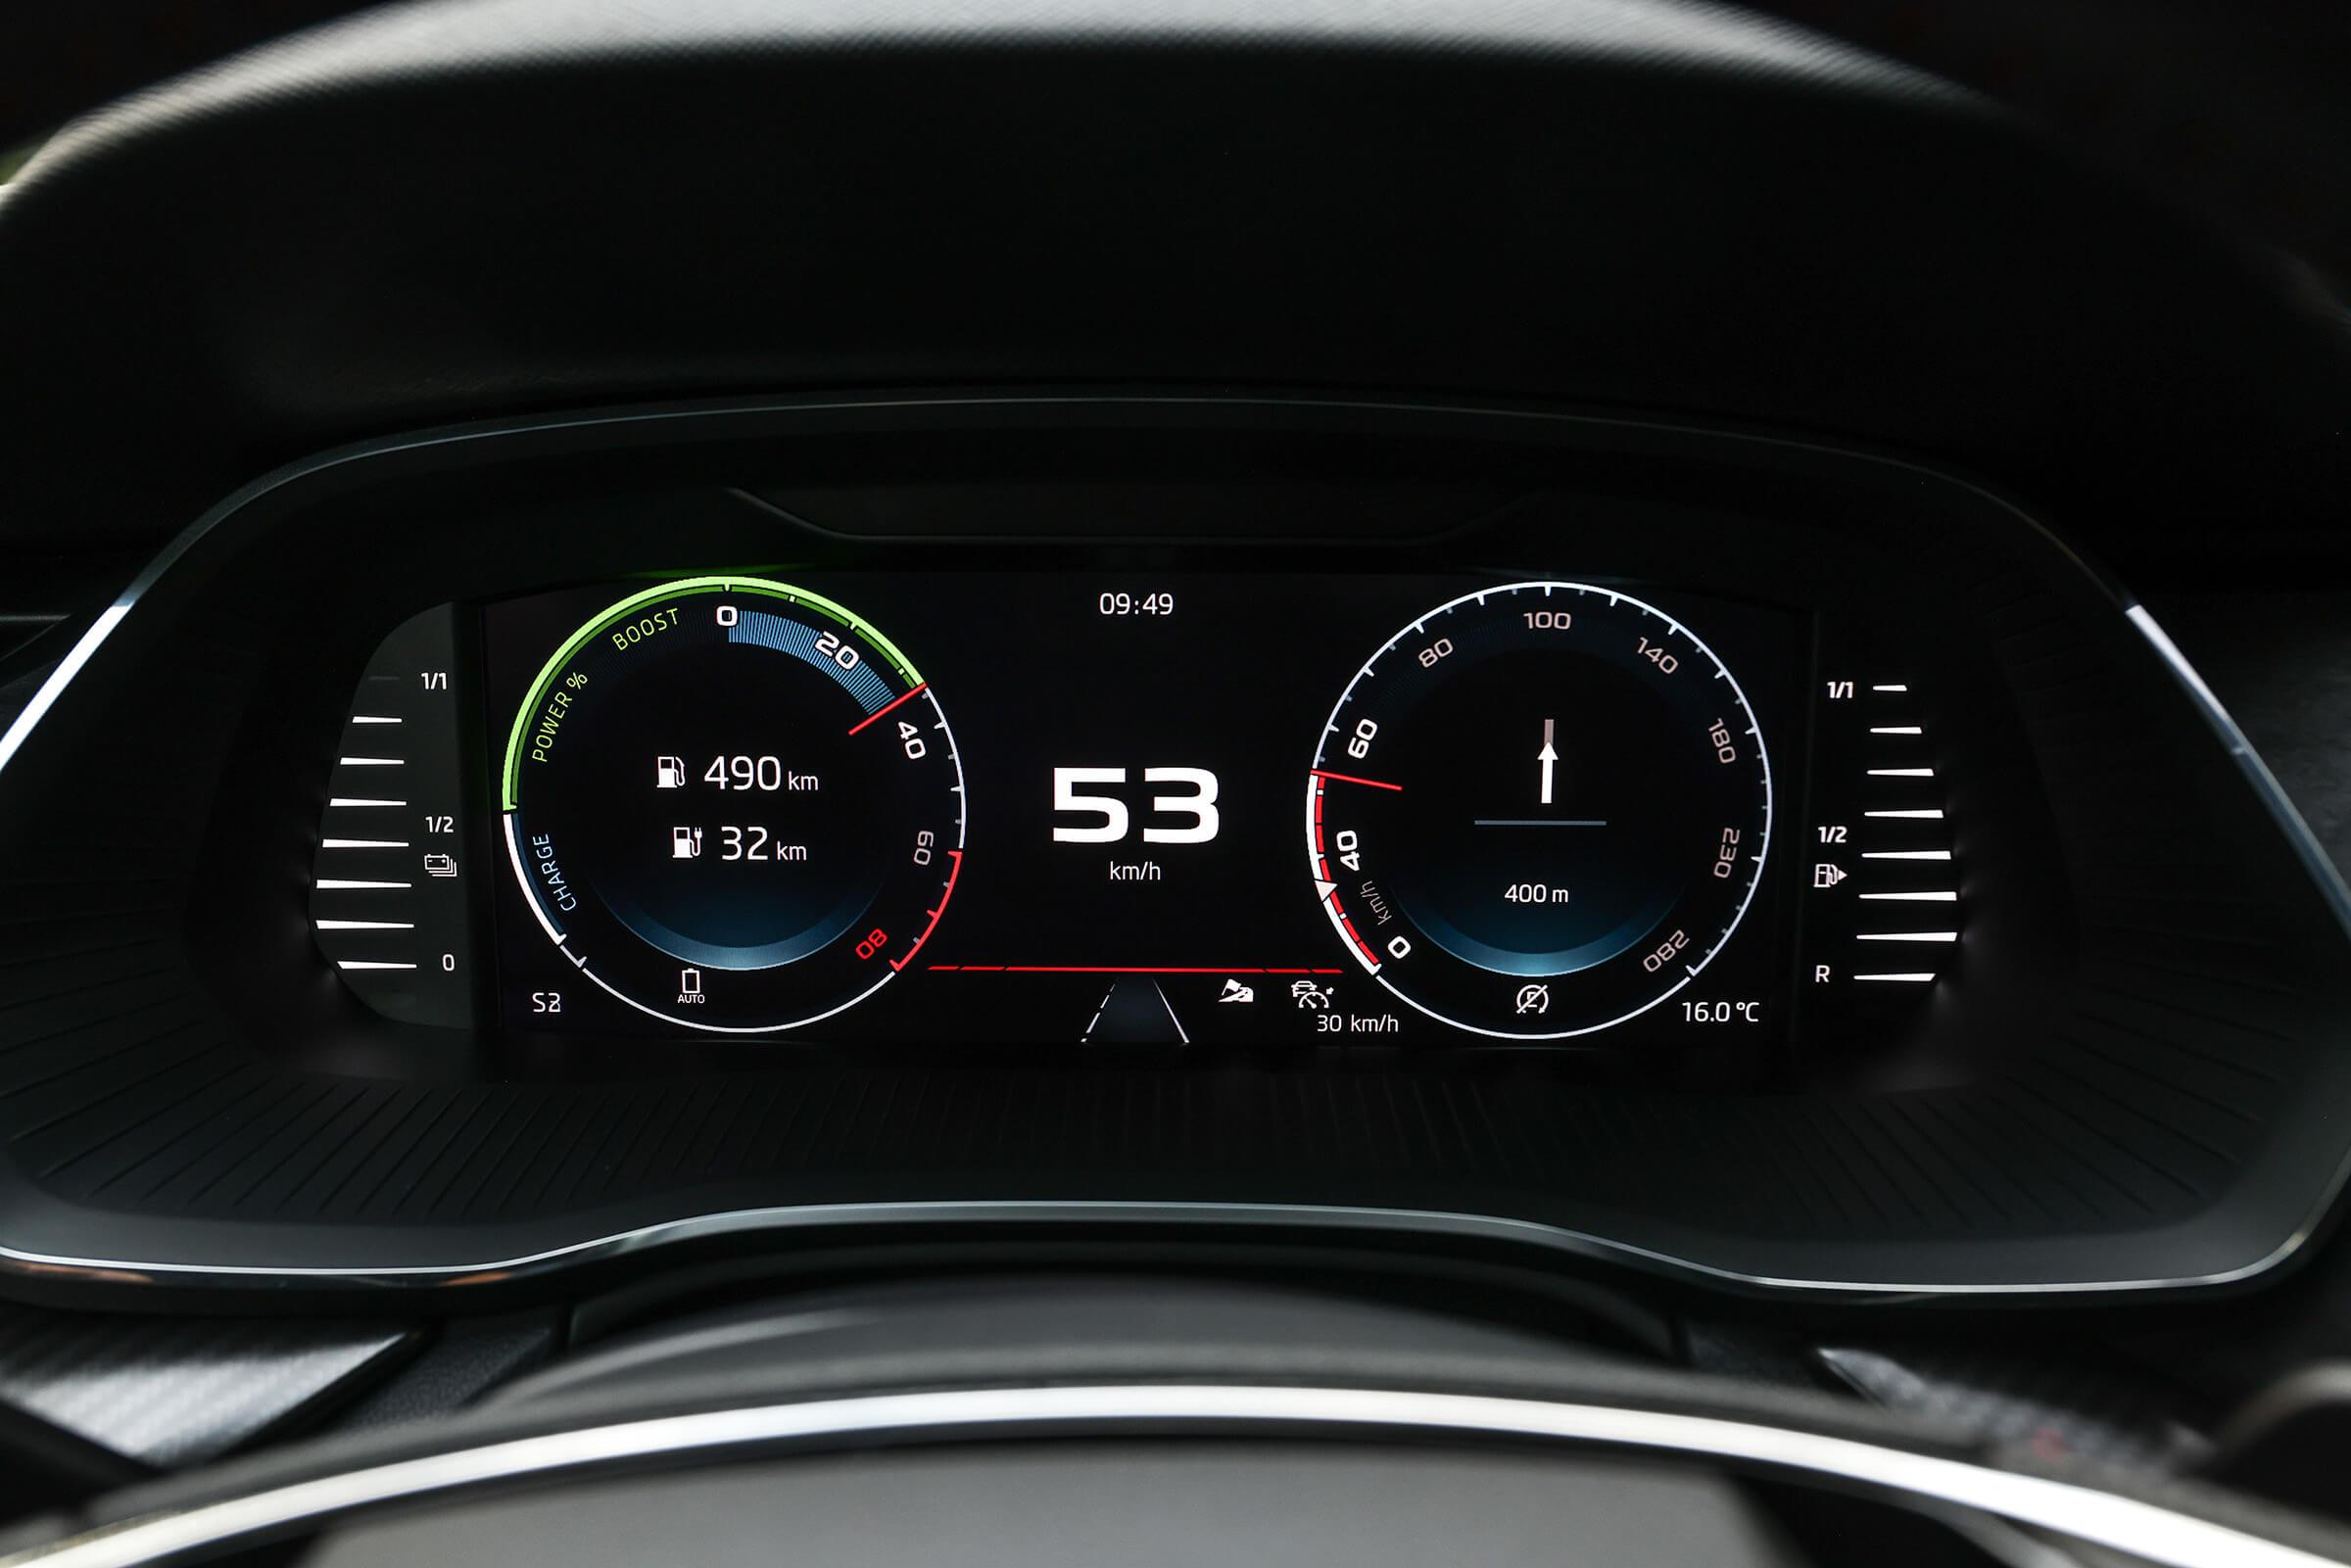 Skoda Octavia RS iV - Κονσόλα